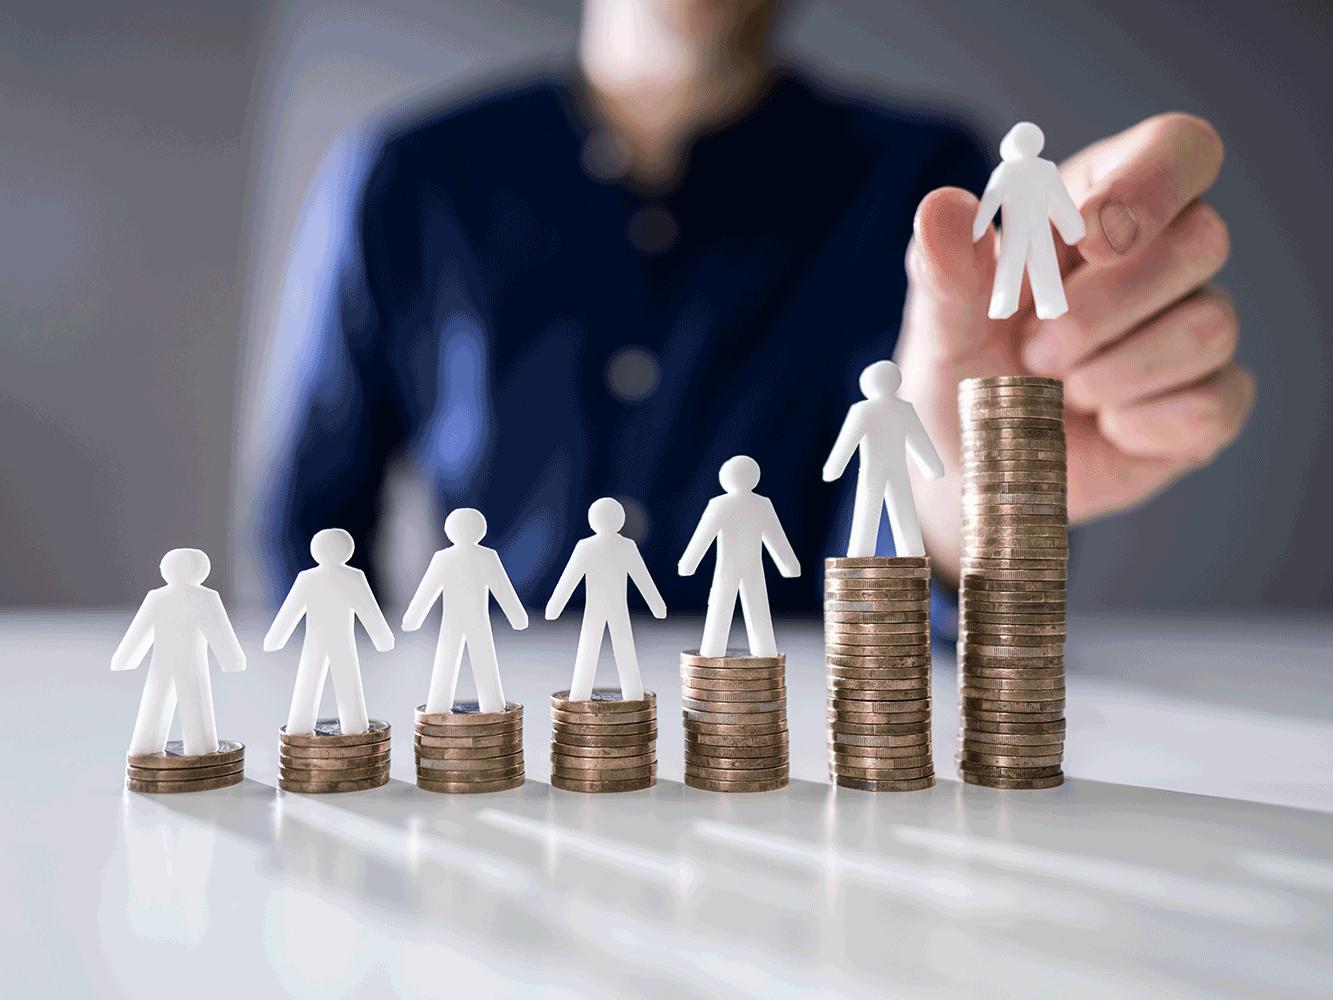 National minimum wage set to increase